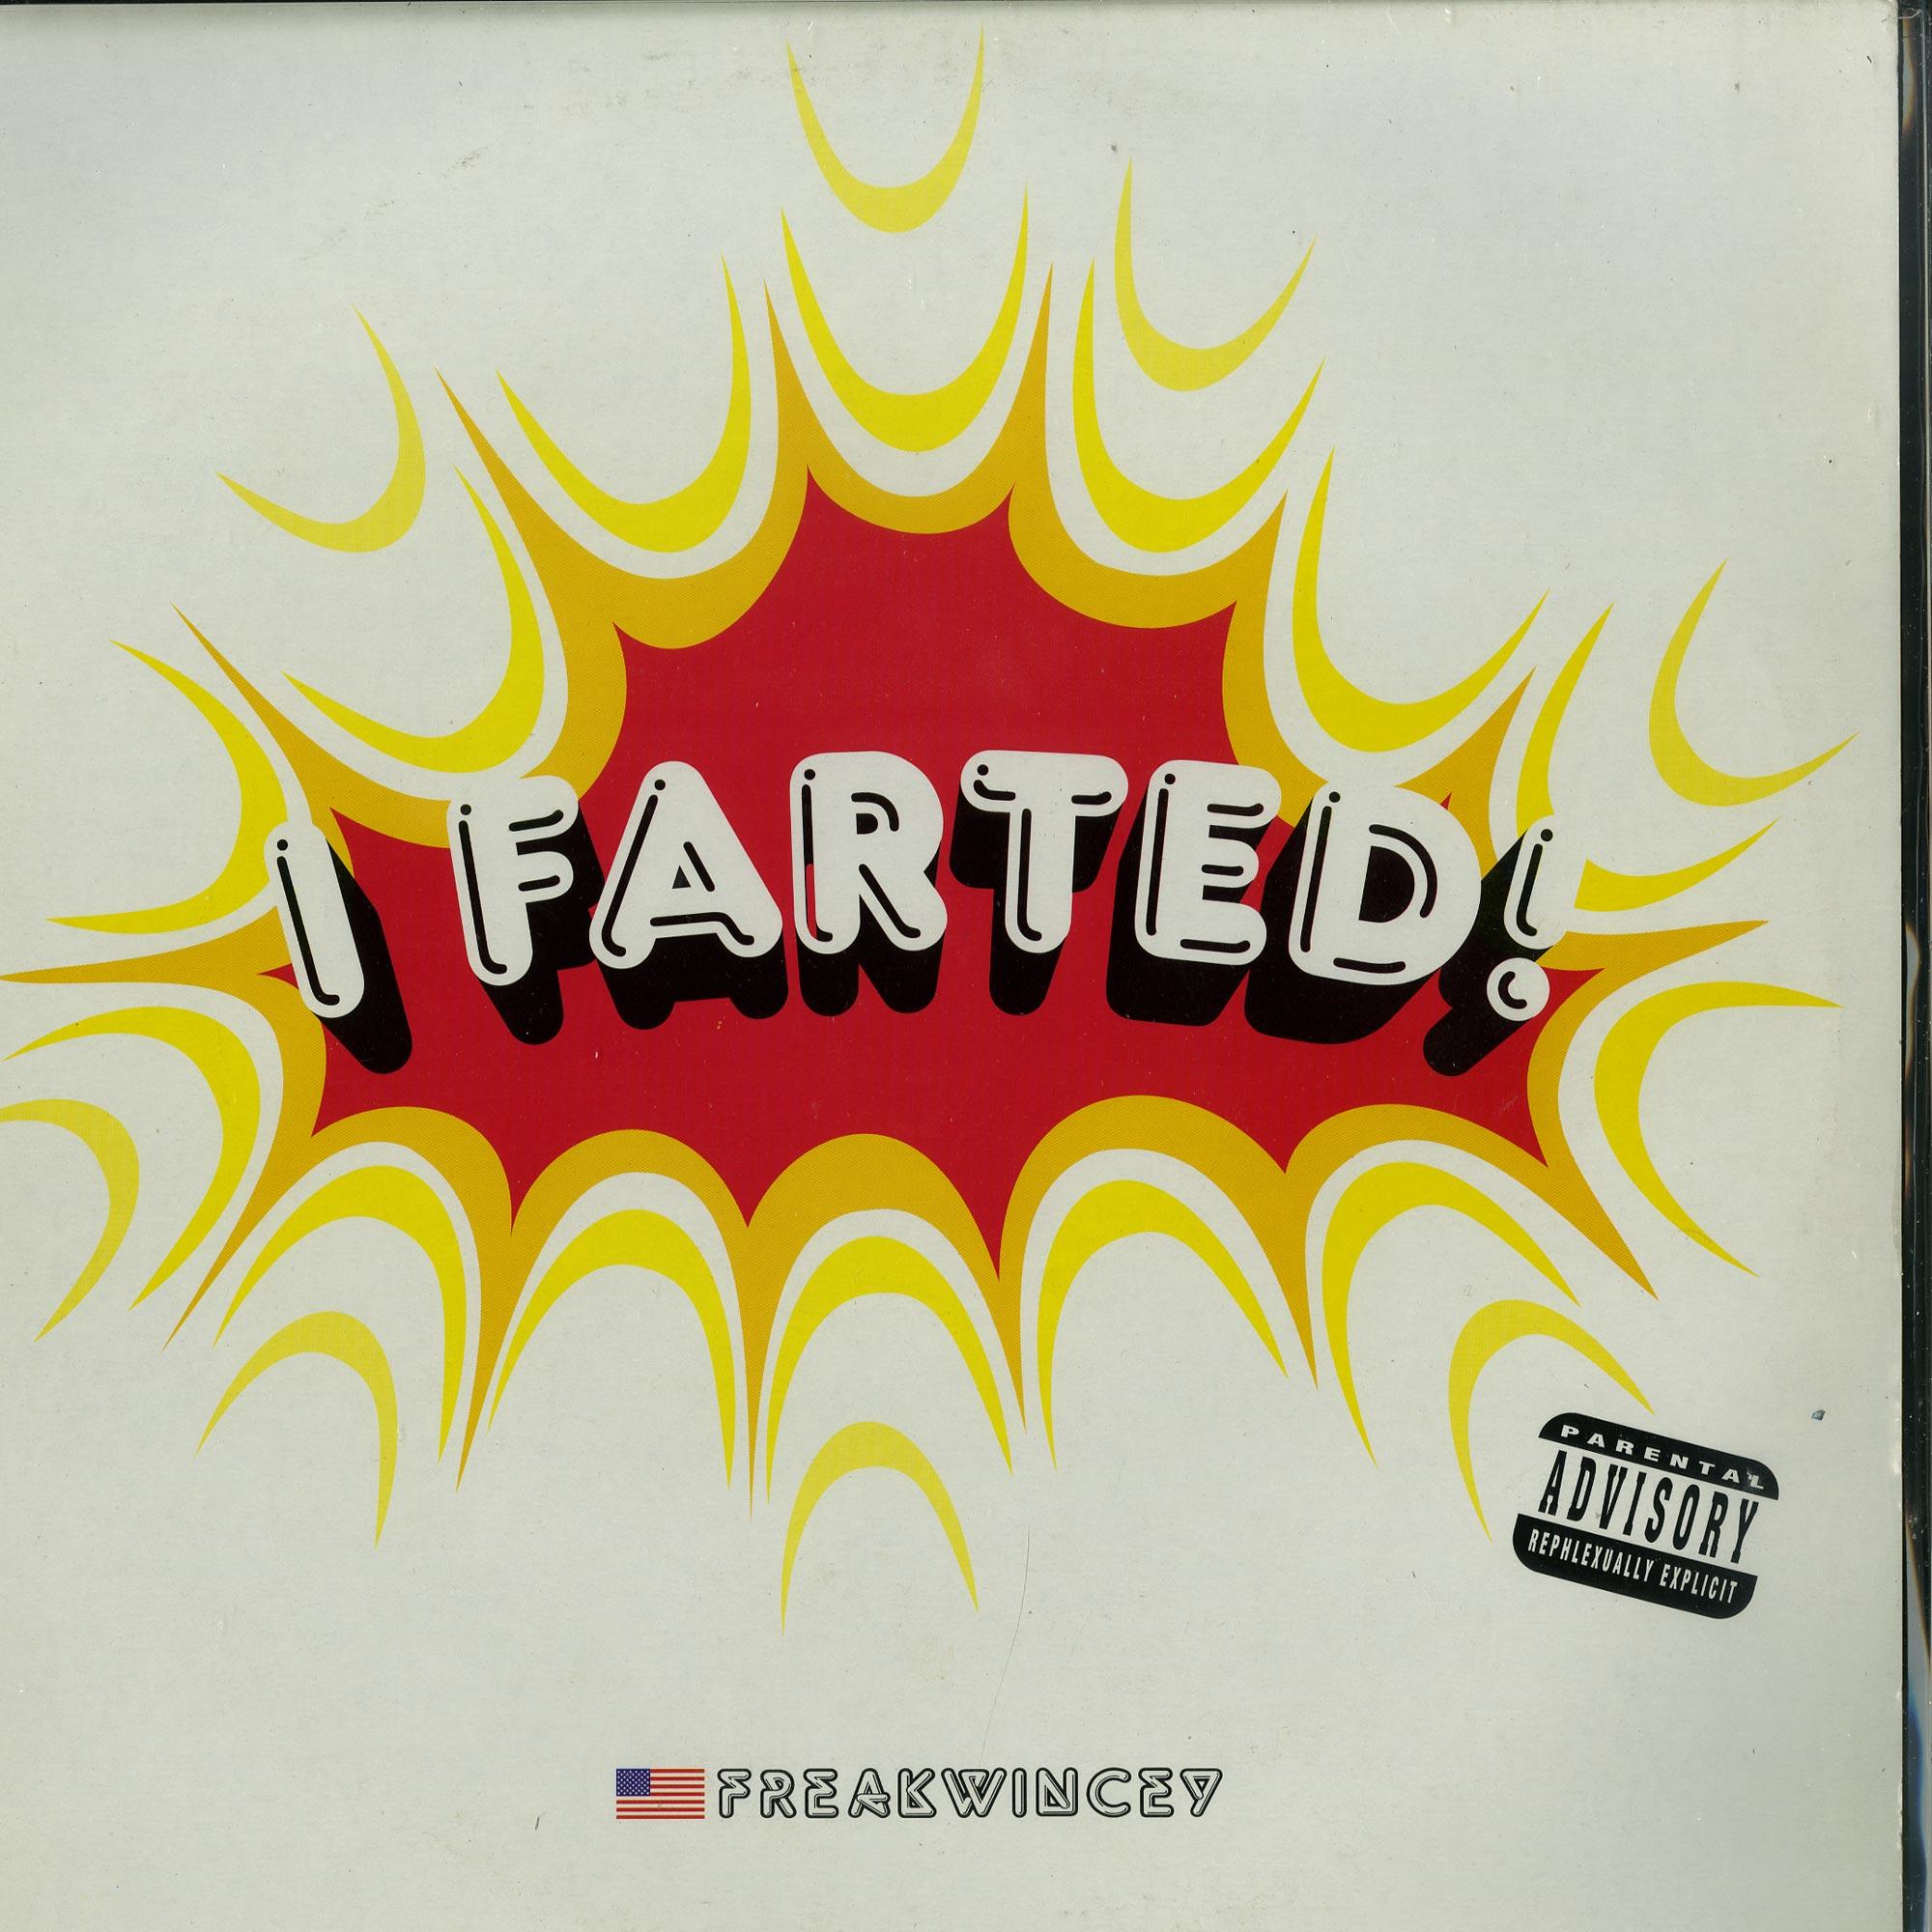 Freakwincey - I FARTED